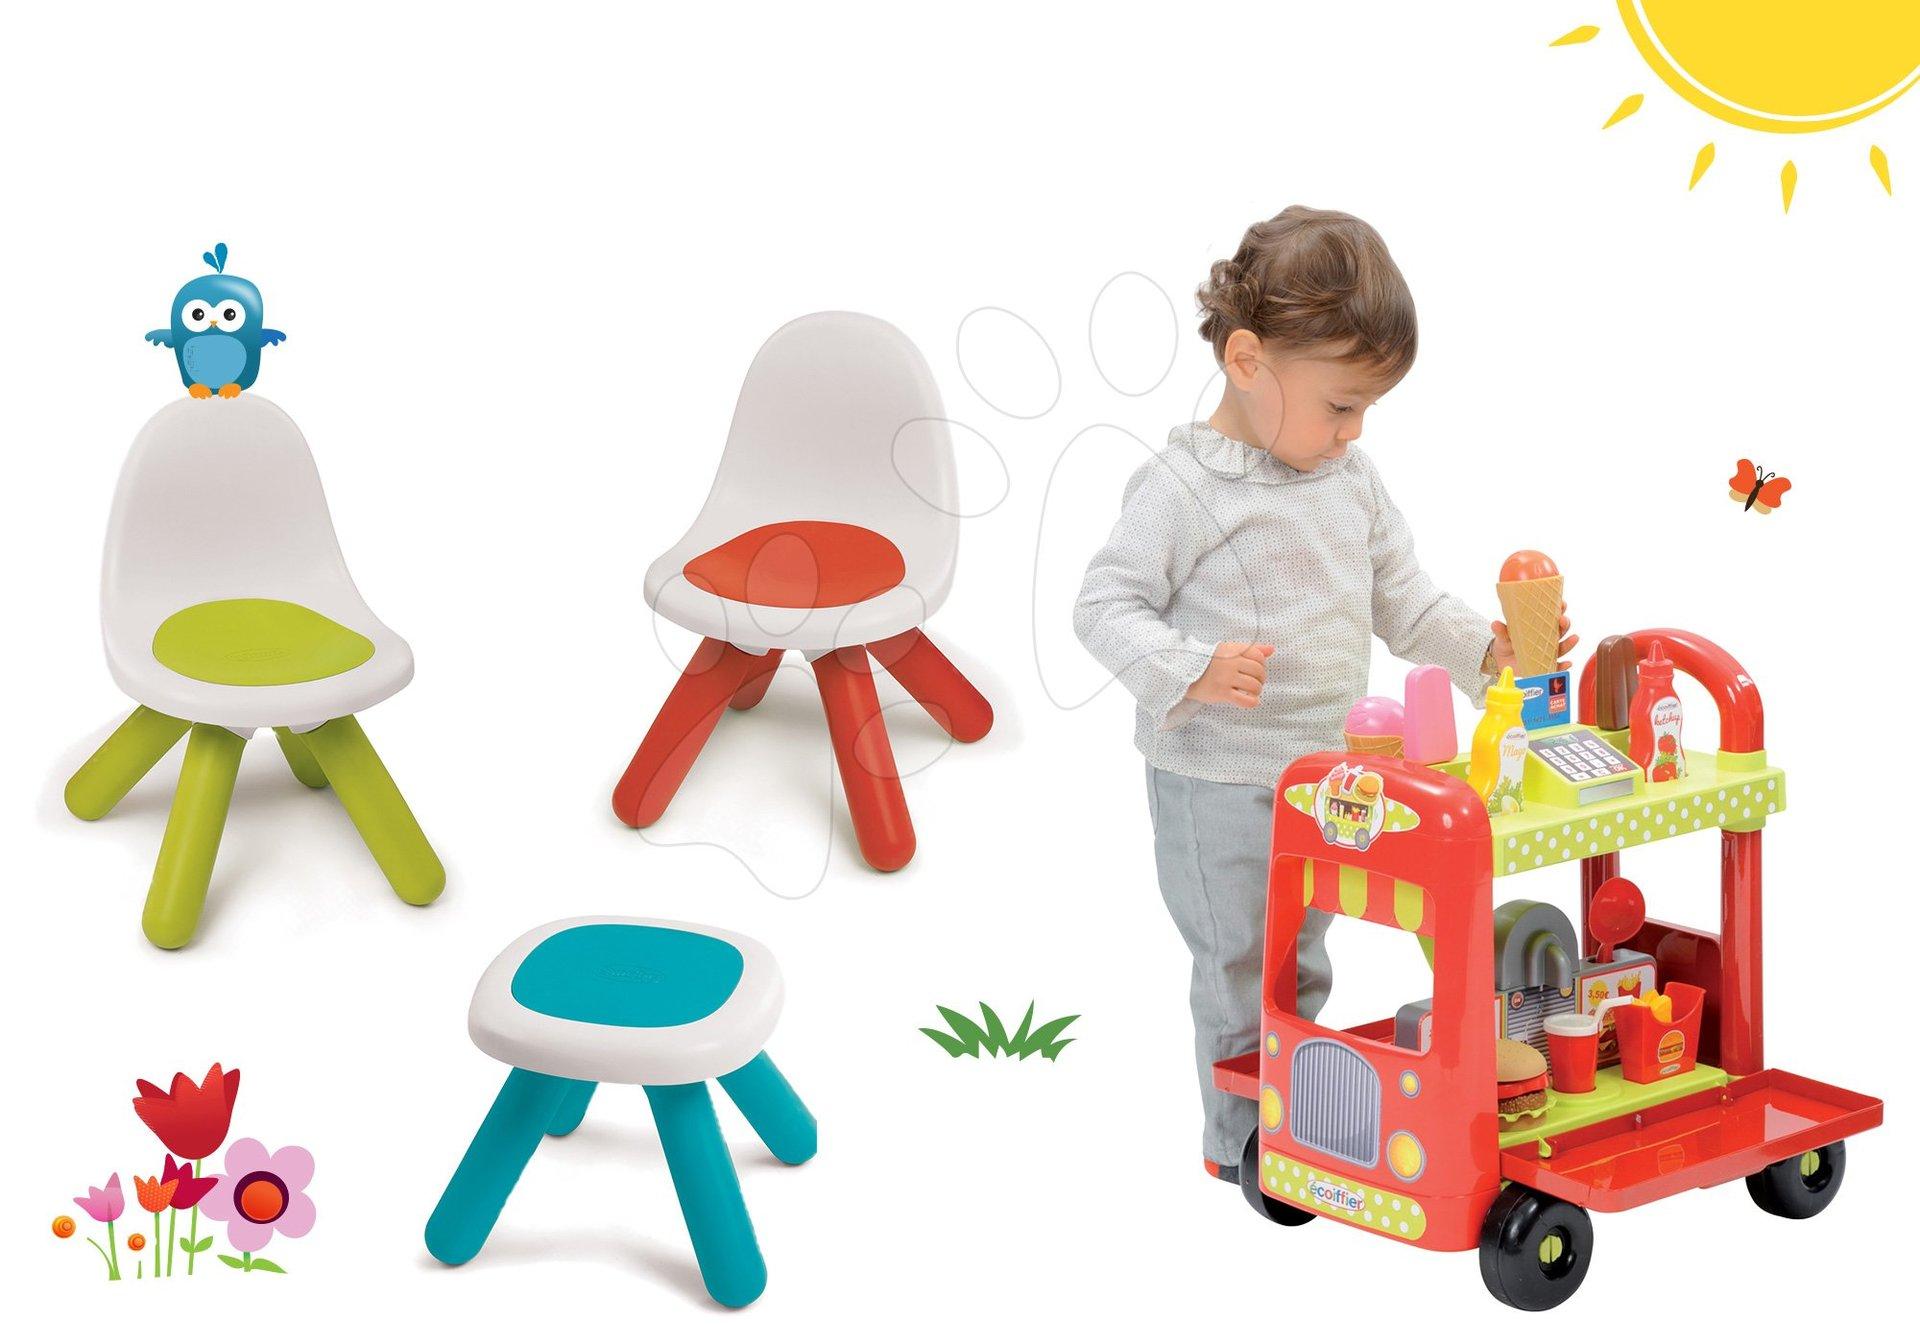 Smoby set stolík pre deti Piknikl, 2 stoličky KidChair a Écoiffier detský vozík so zmrzlinou a hamburgermi 880200A-2